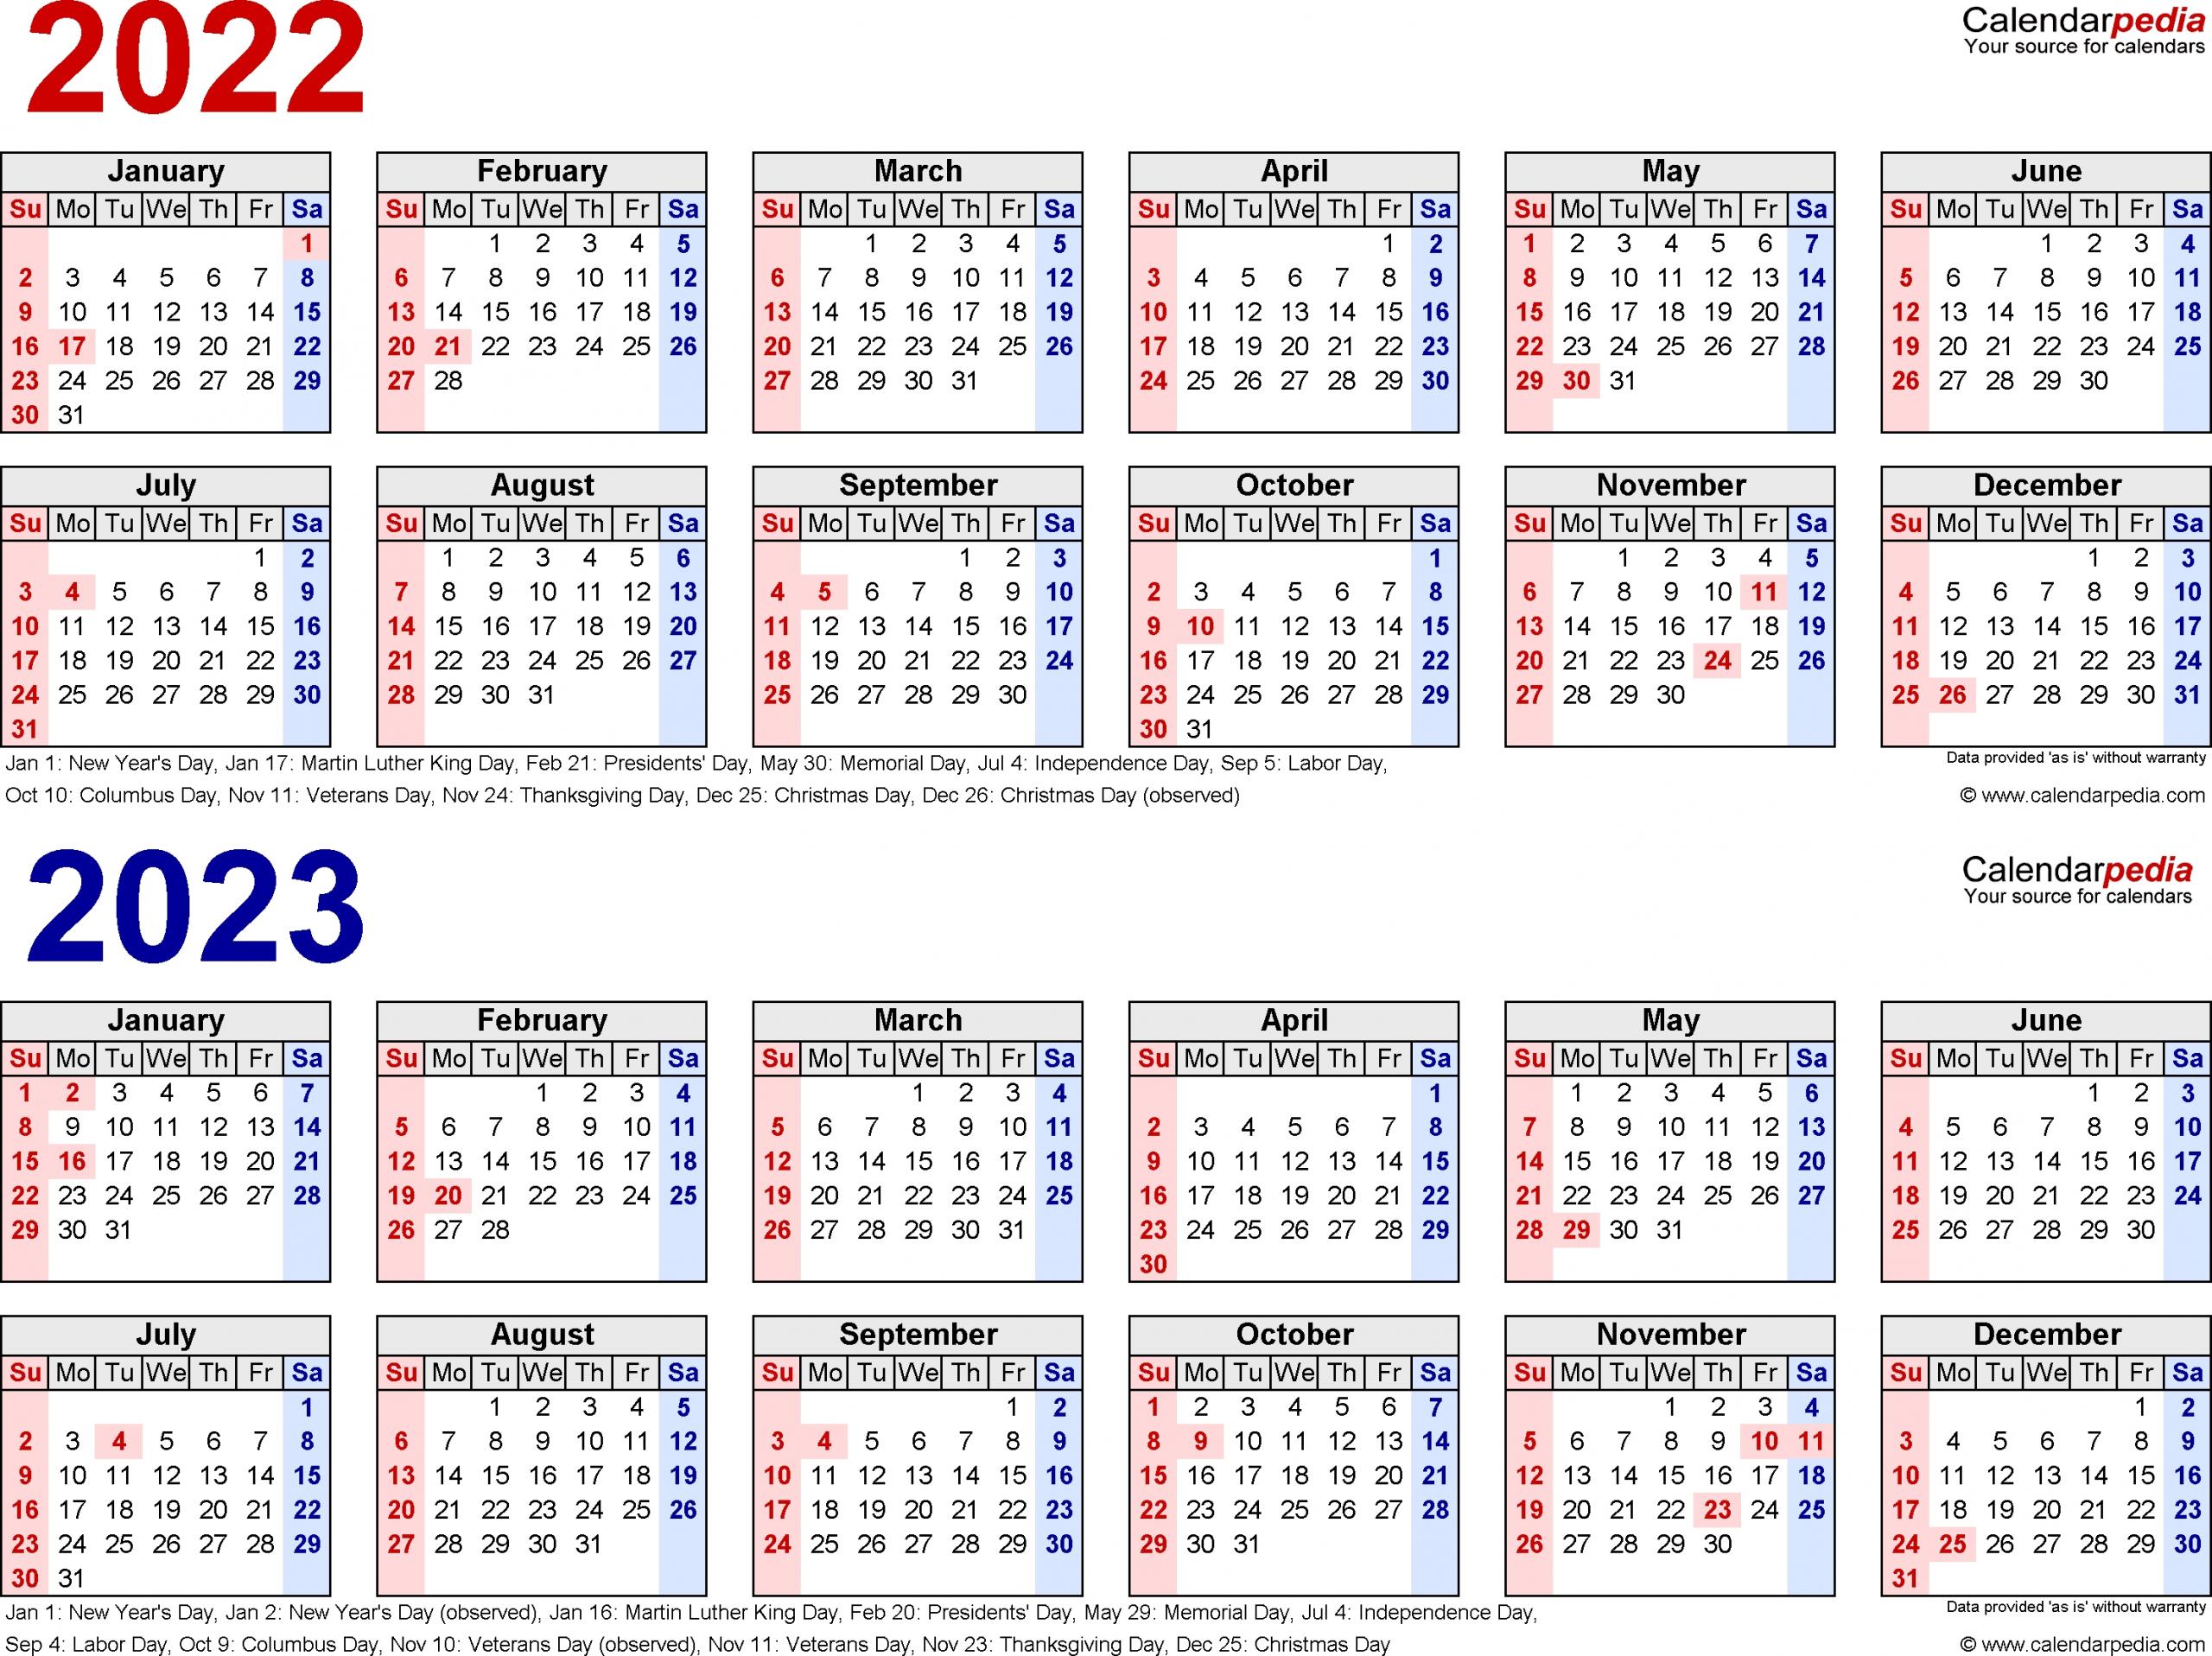 Free Big Printerable Calendars 2020-2023 | Example